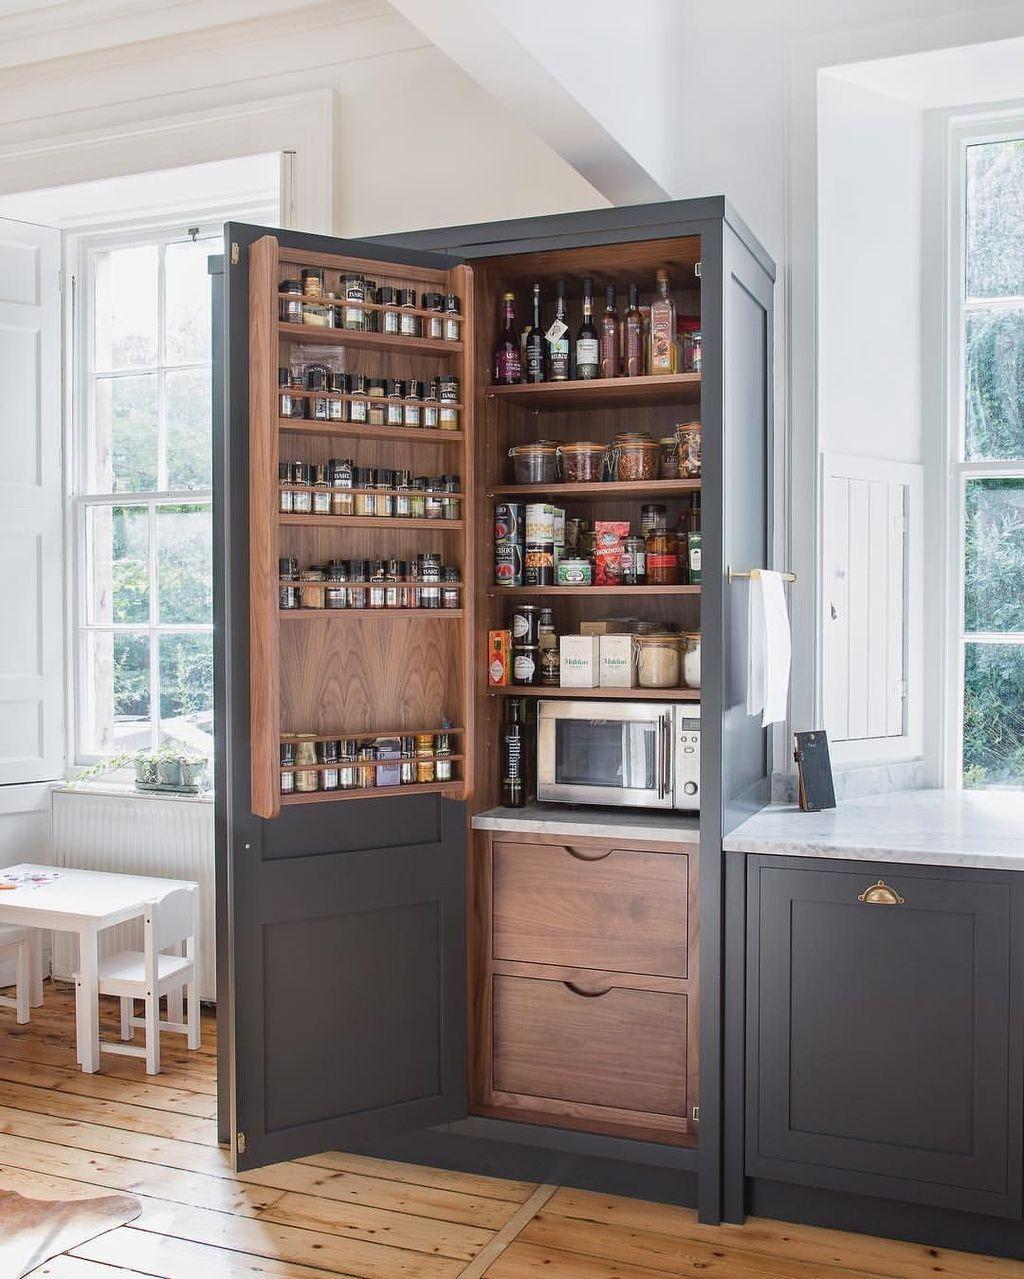 40 Fabulous Farmhouse Kitchen Cabinets Ideas Page 5 Of 44 Aidah Decor Kitchen Cabinet Styles Farmhouse Style Kitchen Farmhouse Style Kitchen Cabinets